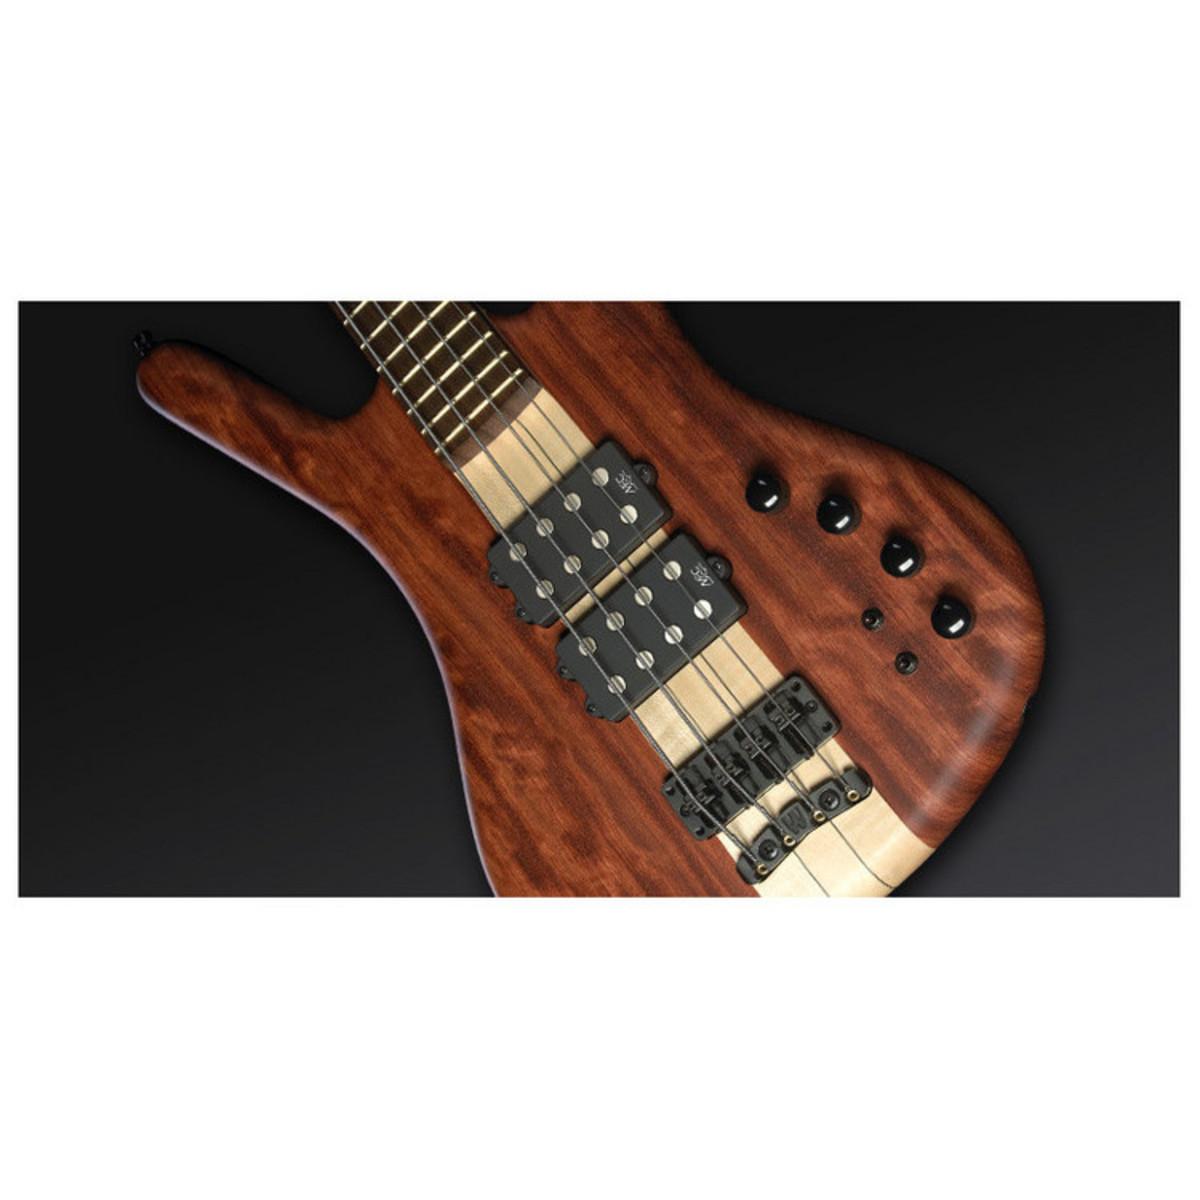 warwick corvette 4 string bass guitar bubinga natural oil finish at. Black Bedroom Furniture Sets. Home Design Ideas